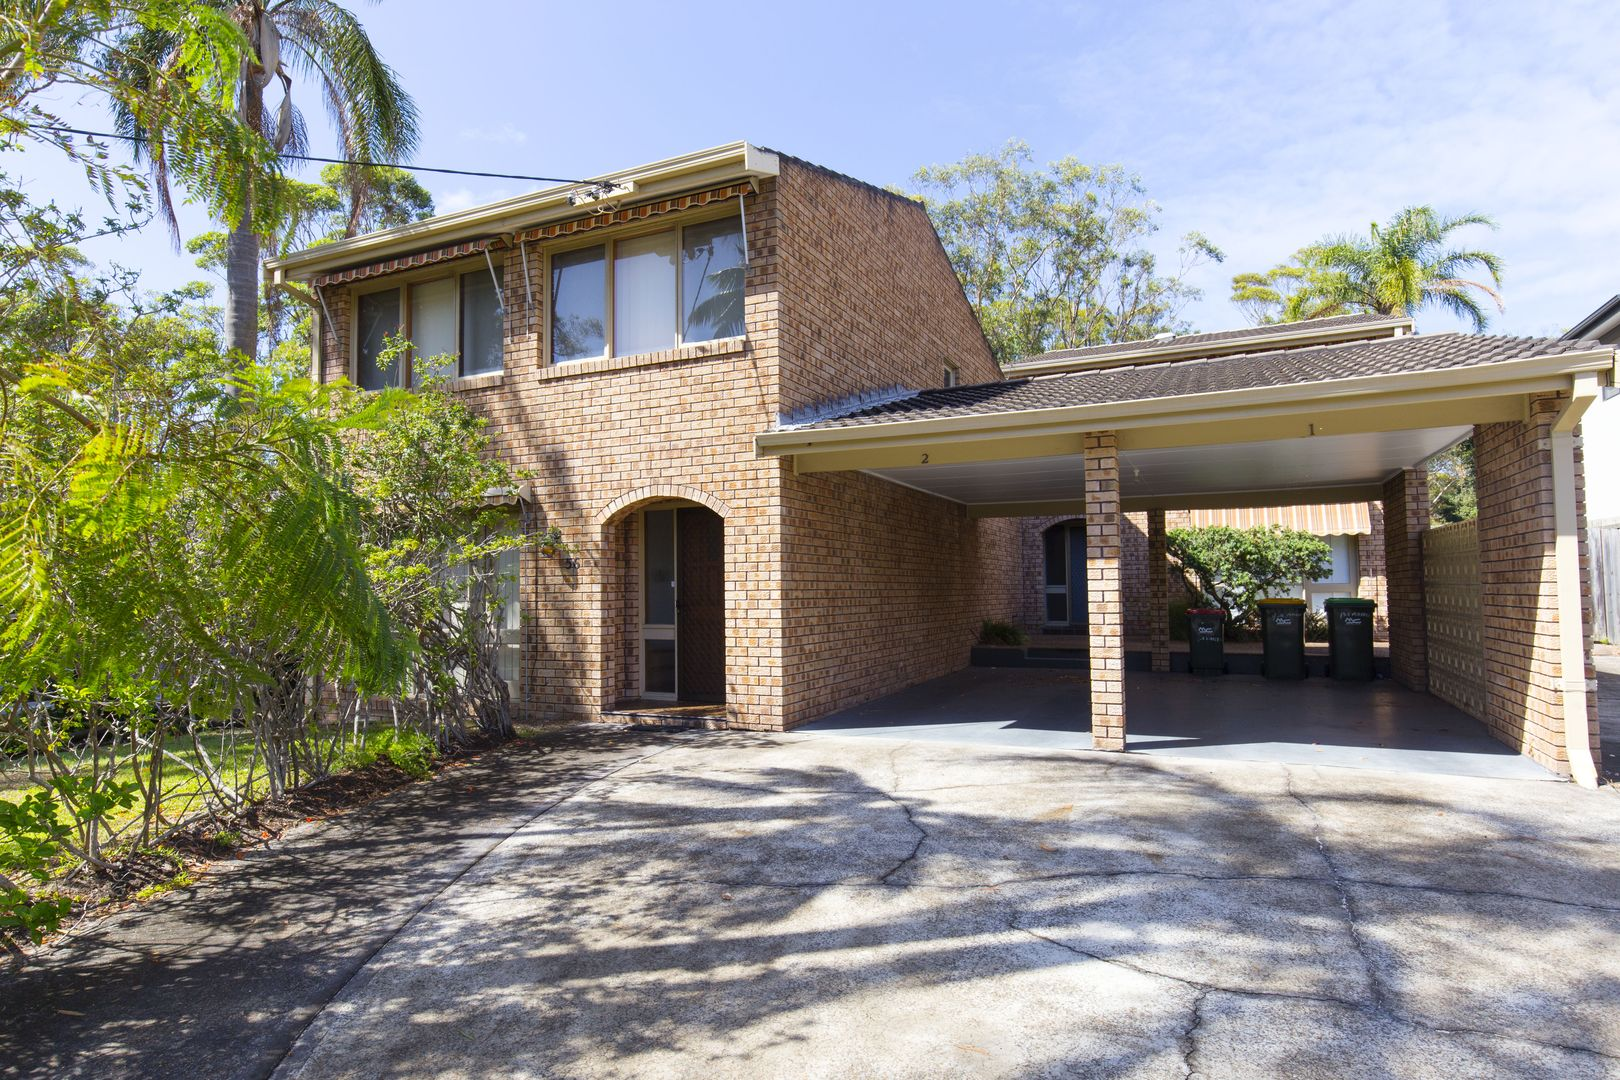 2/56 Mirreen Street, Hawks Nest NSW 2324, Image 0